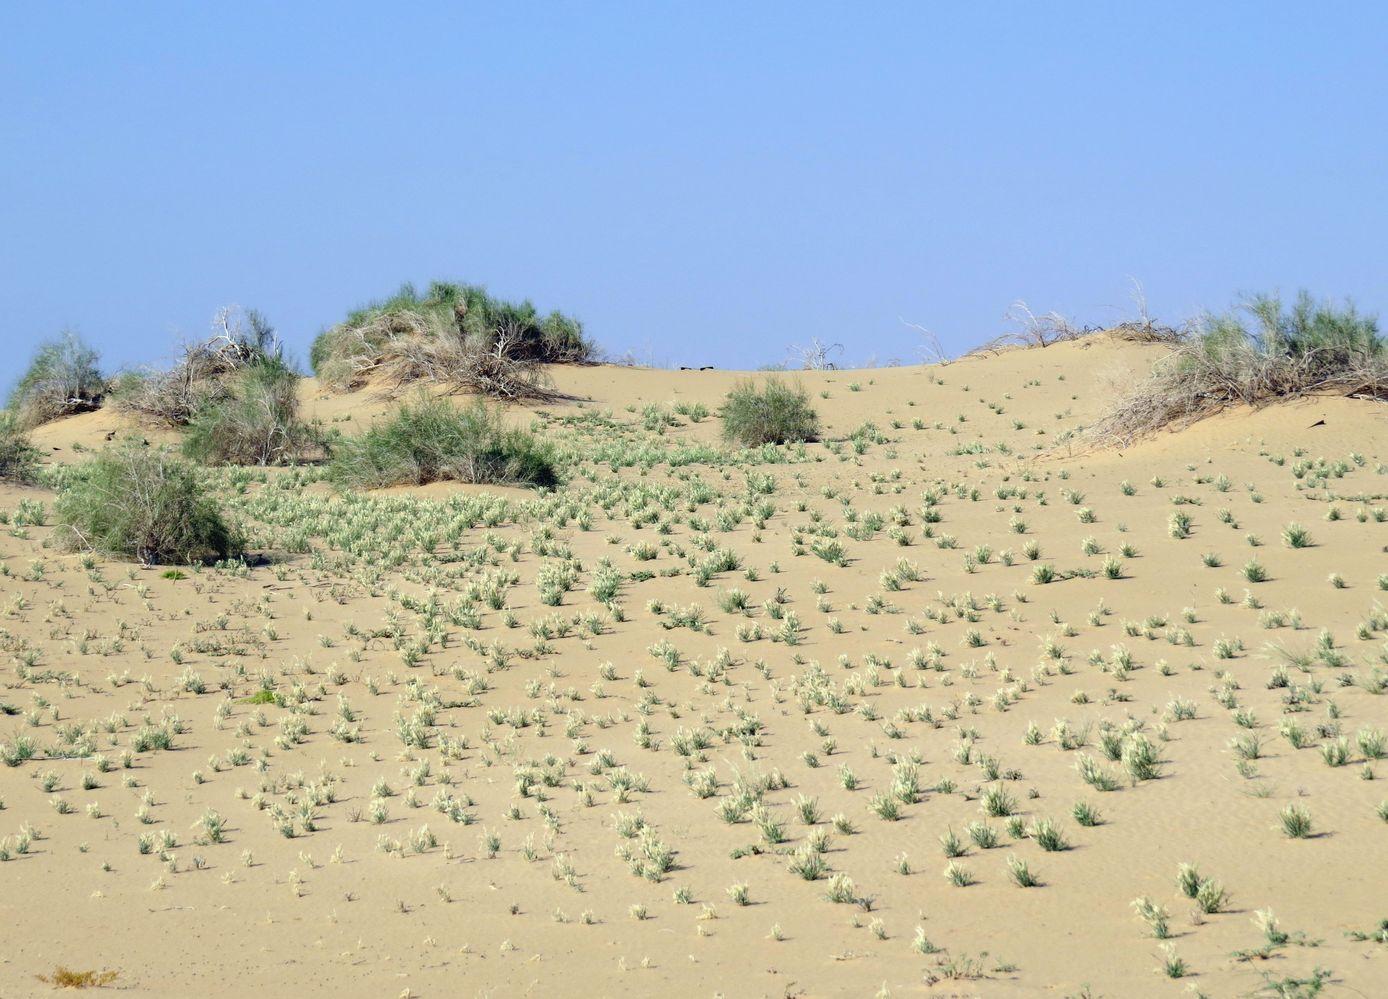 песчаные гряды картинка кулинарном